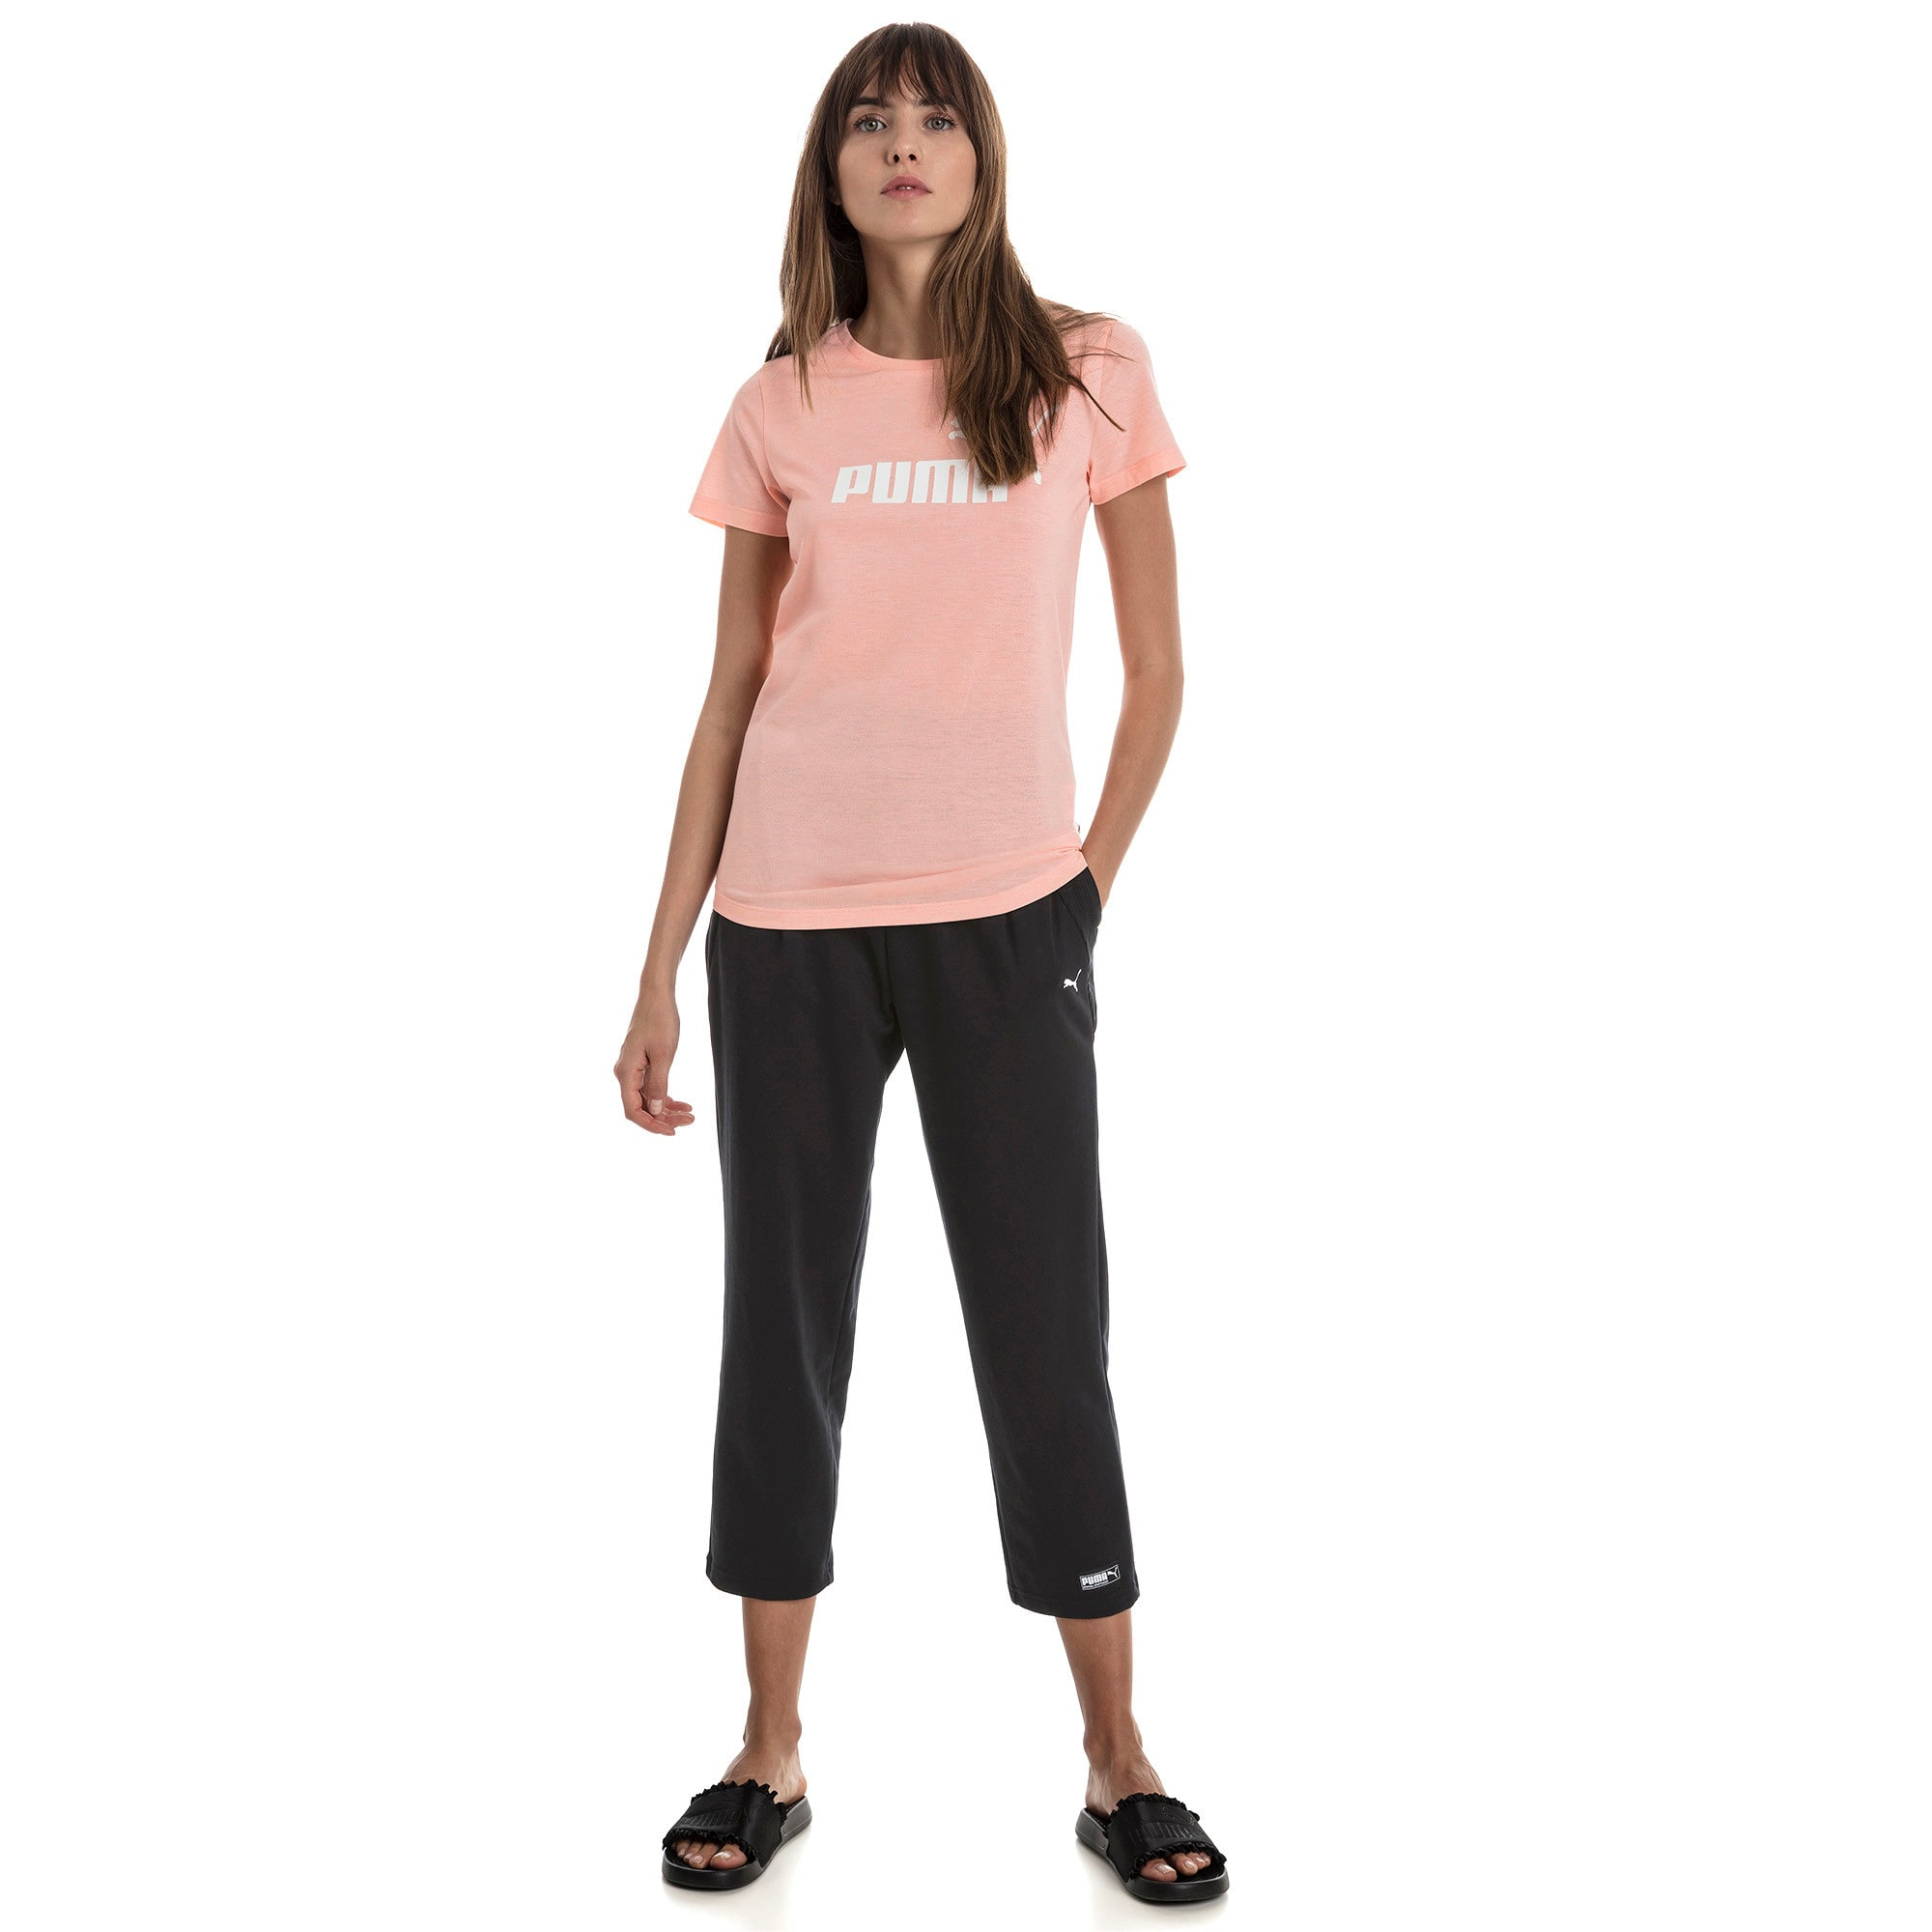 Thumbnail 3 of Fusion Women's Sweatpants, Cotton Black, medium